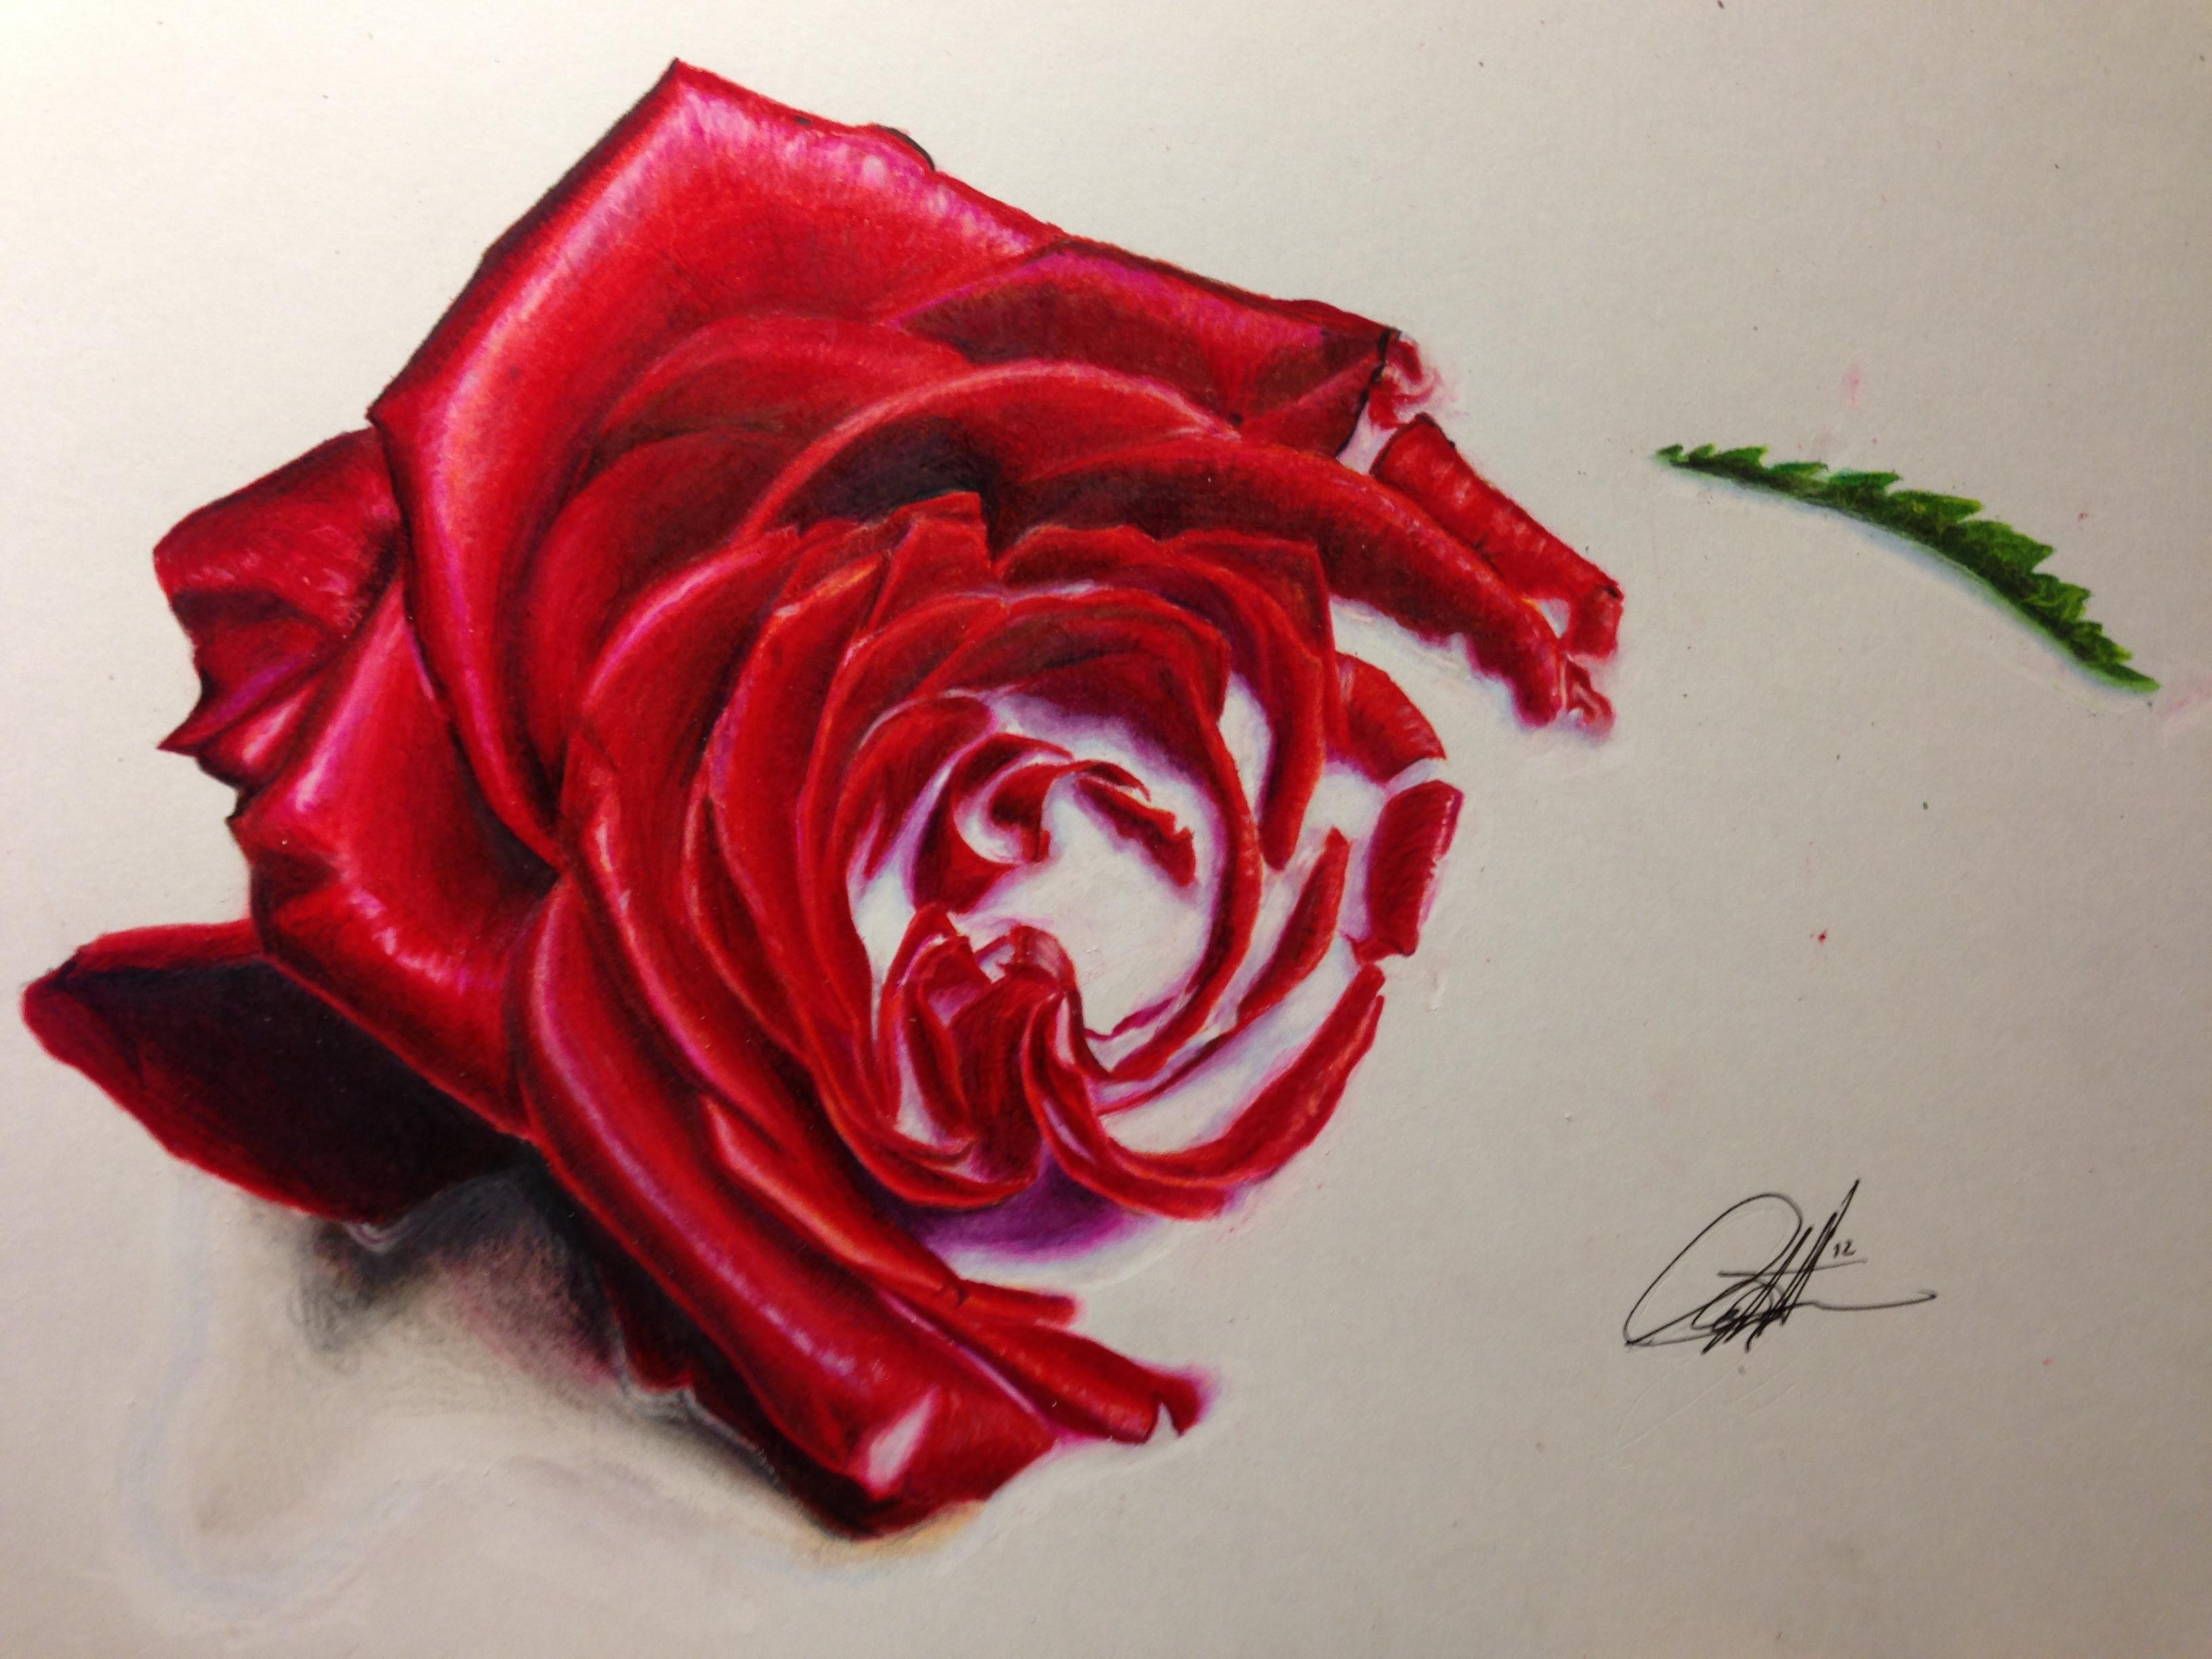 Roses are ff0000 by ChrisHerreraArt on DeviantArt